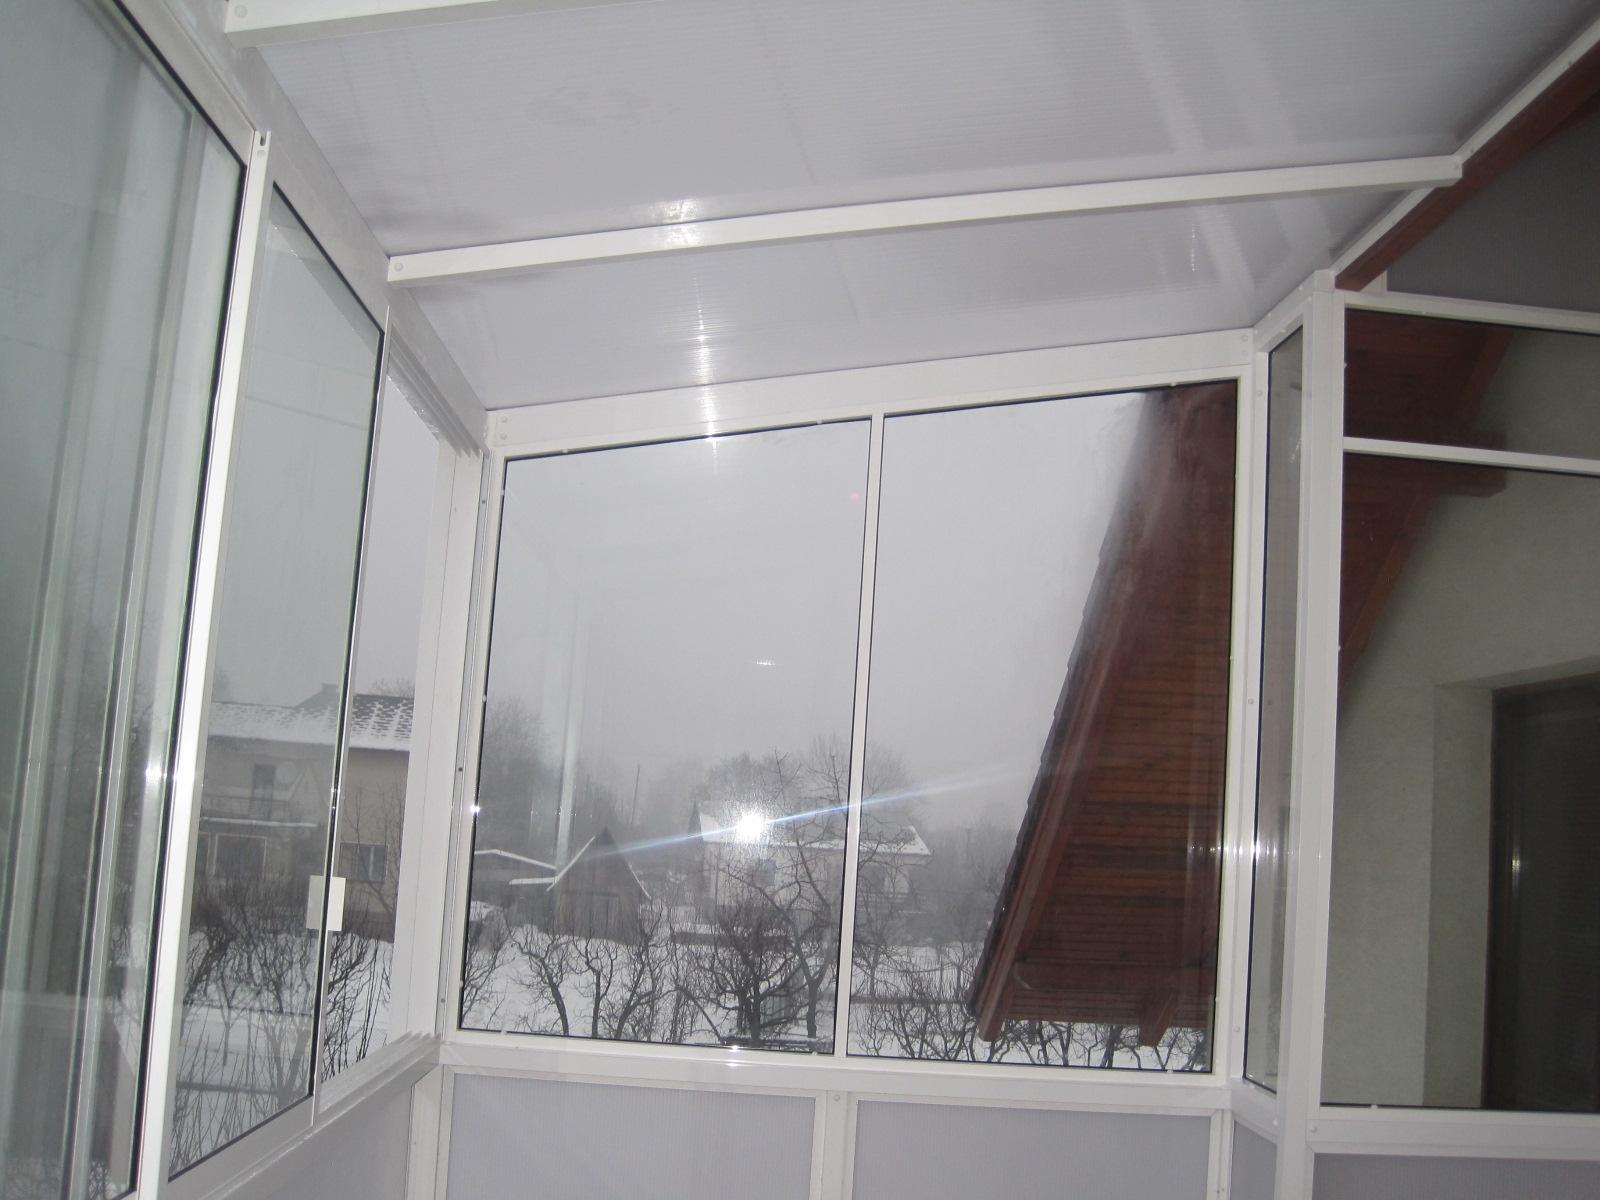 Verglasung Der Terrasse - Koseca-ilava - Pifema S.r.o. Verglaste Terrasse Oder Veranda